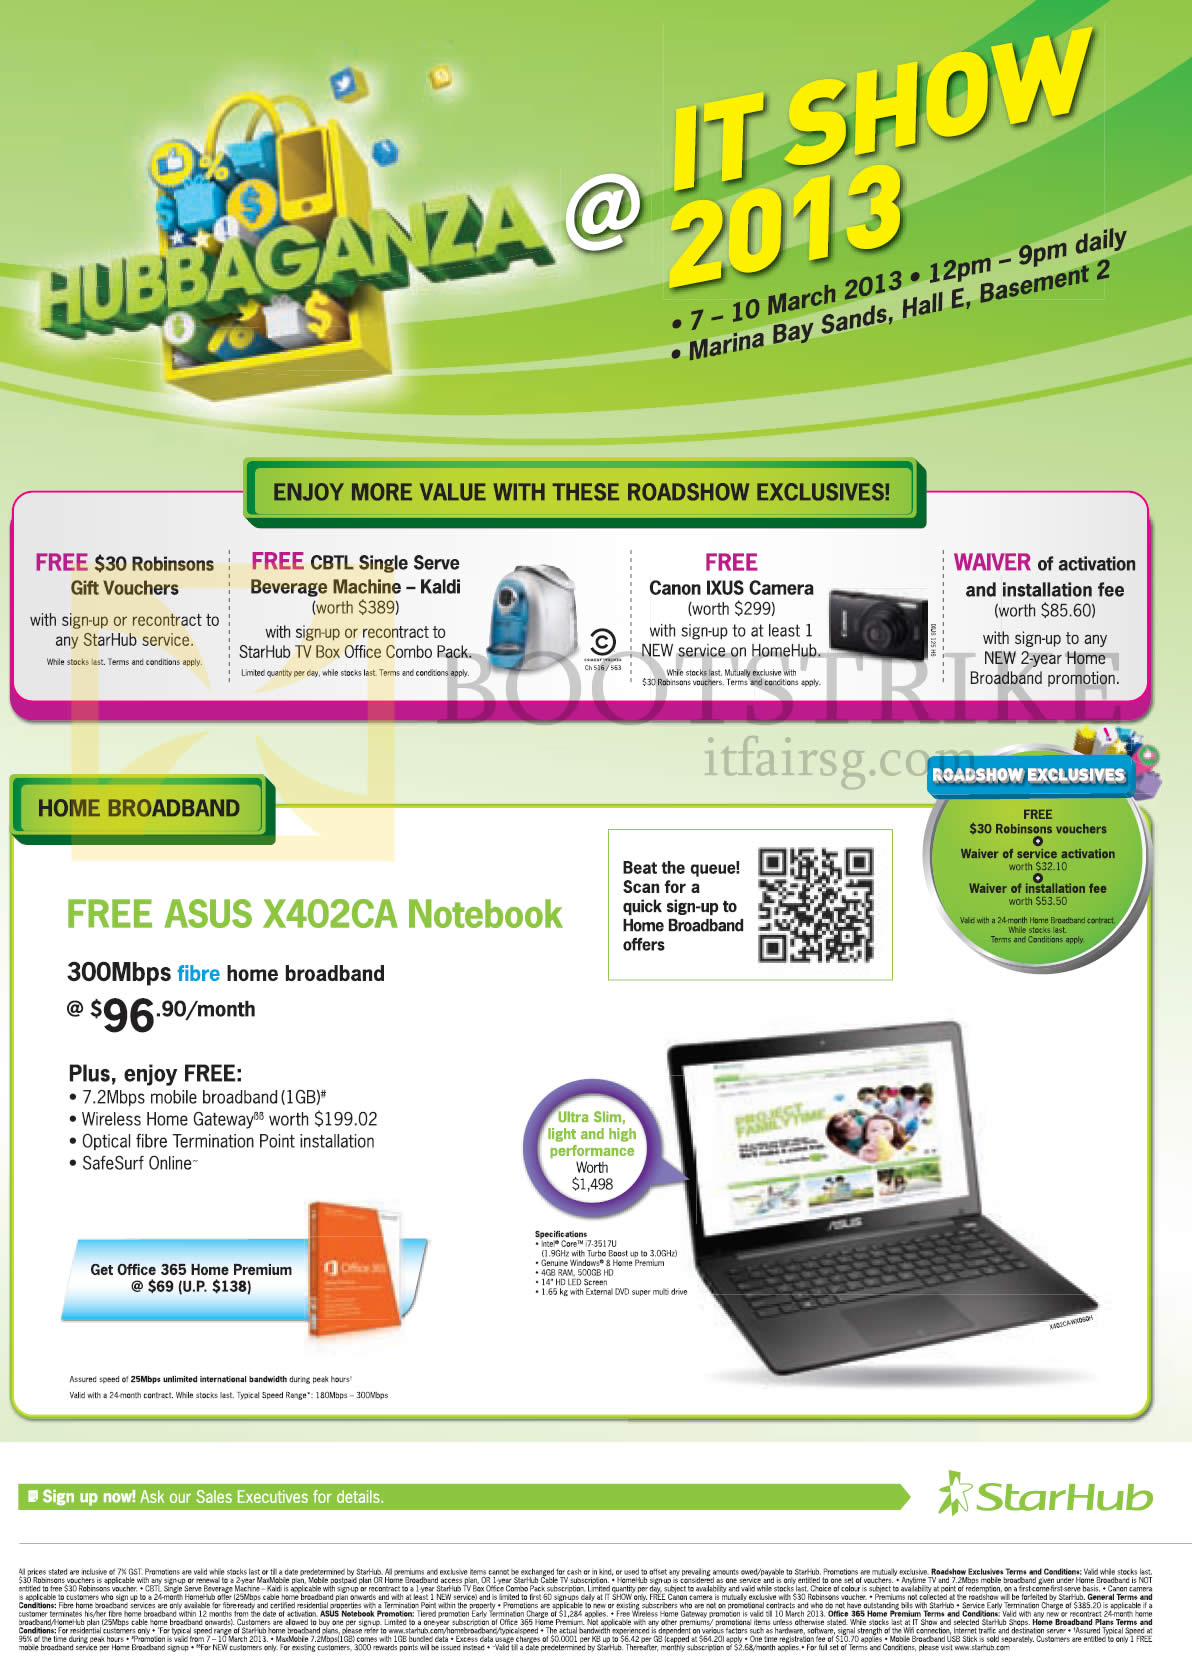 IT SHOW 2013 price list image brochure of Starhub Broadband Fibre 300Mbps Free ASUS X402CA Notebook, Free Robinsons Vouchers, CBTL Single Serve Beverage Machine Kaldi, Canon Ixus Digital Camera, Waiver